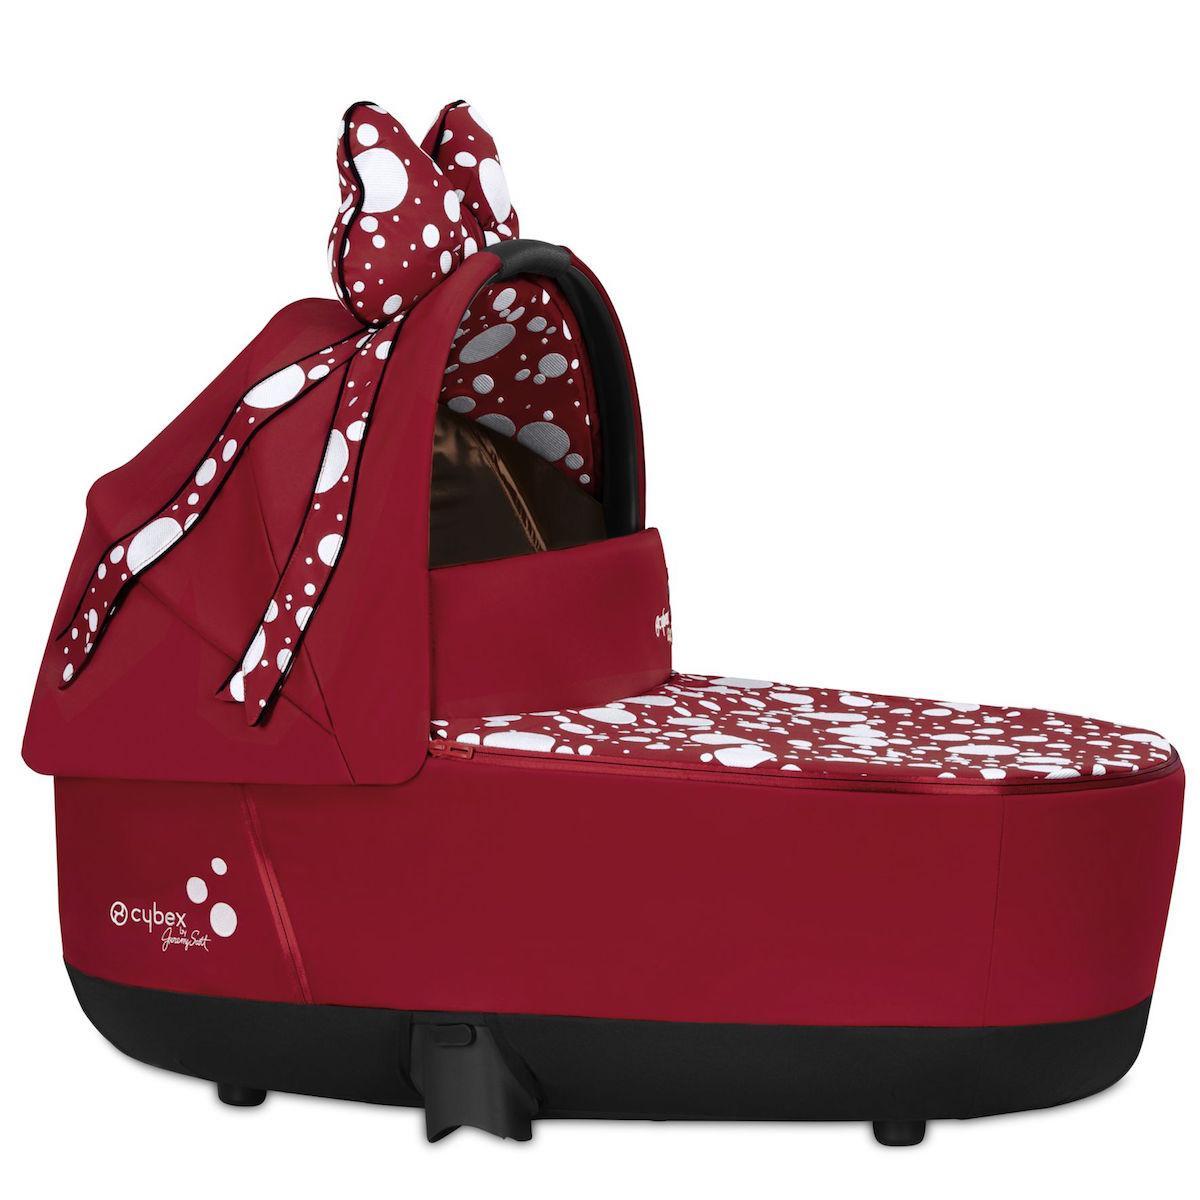 Nacelle luxe PRIAM Cybex Petticoat Red Cybex dark red